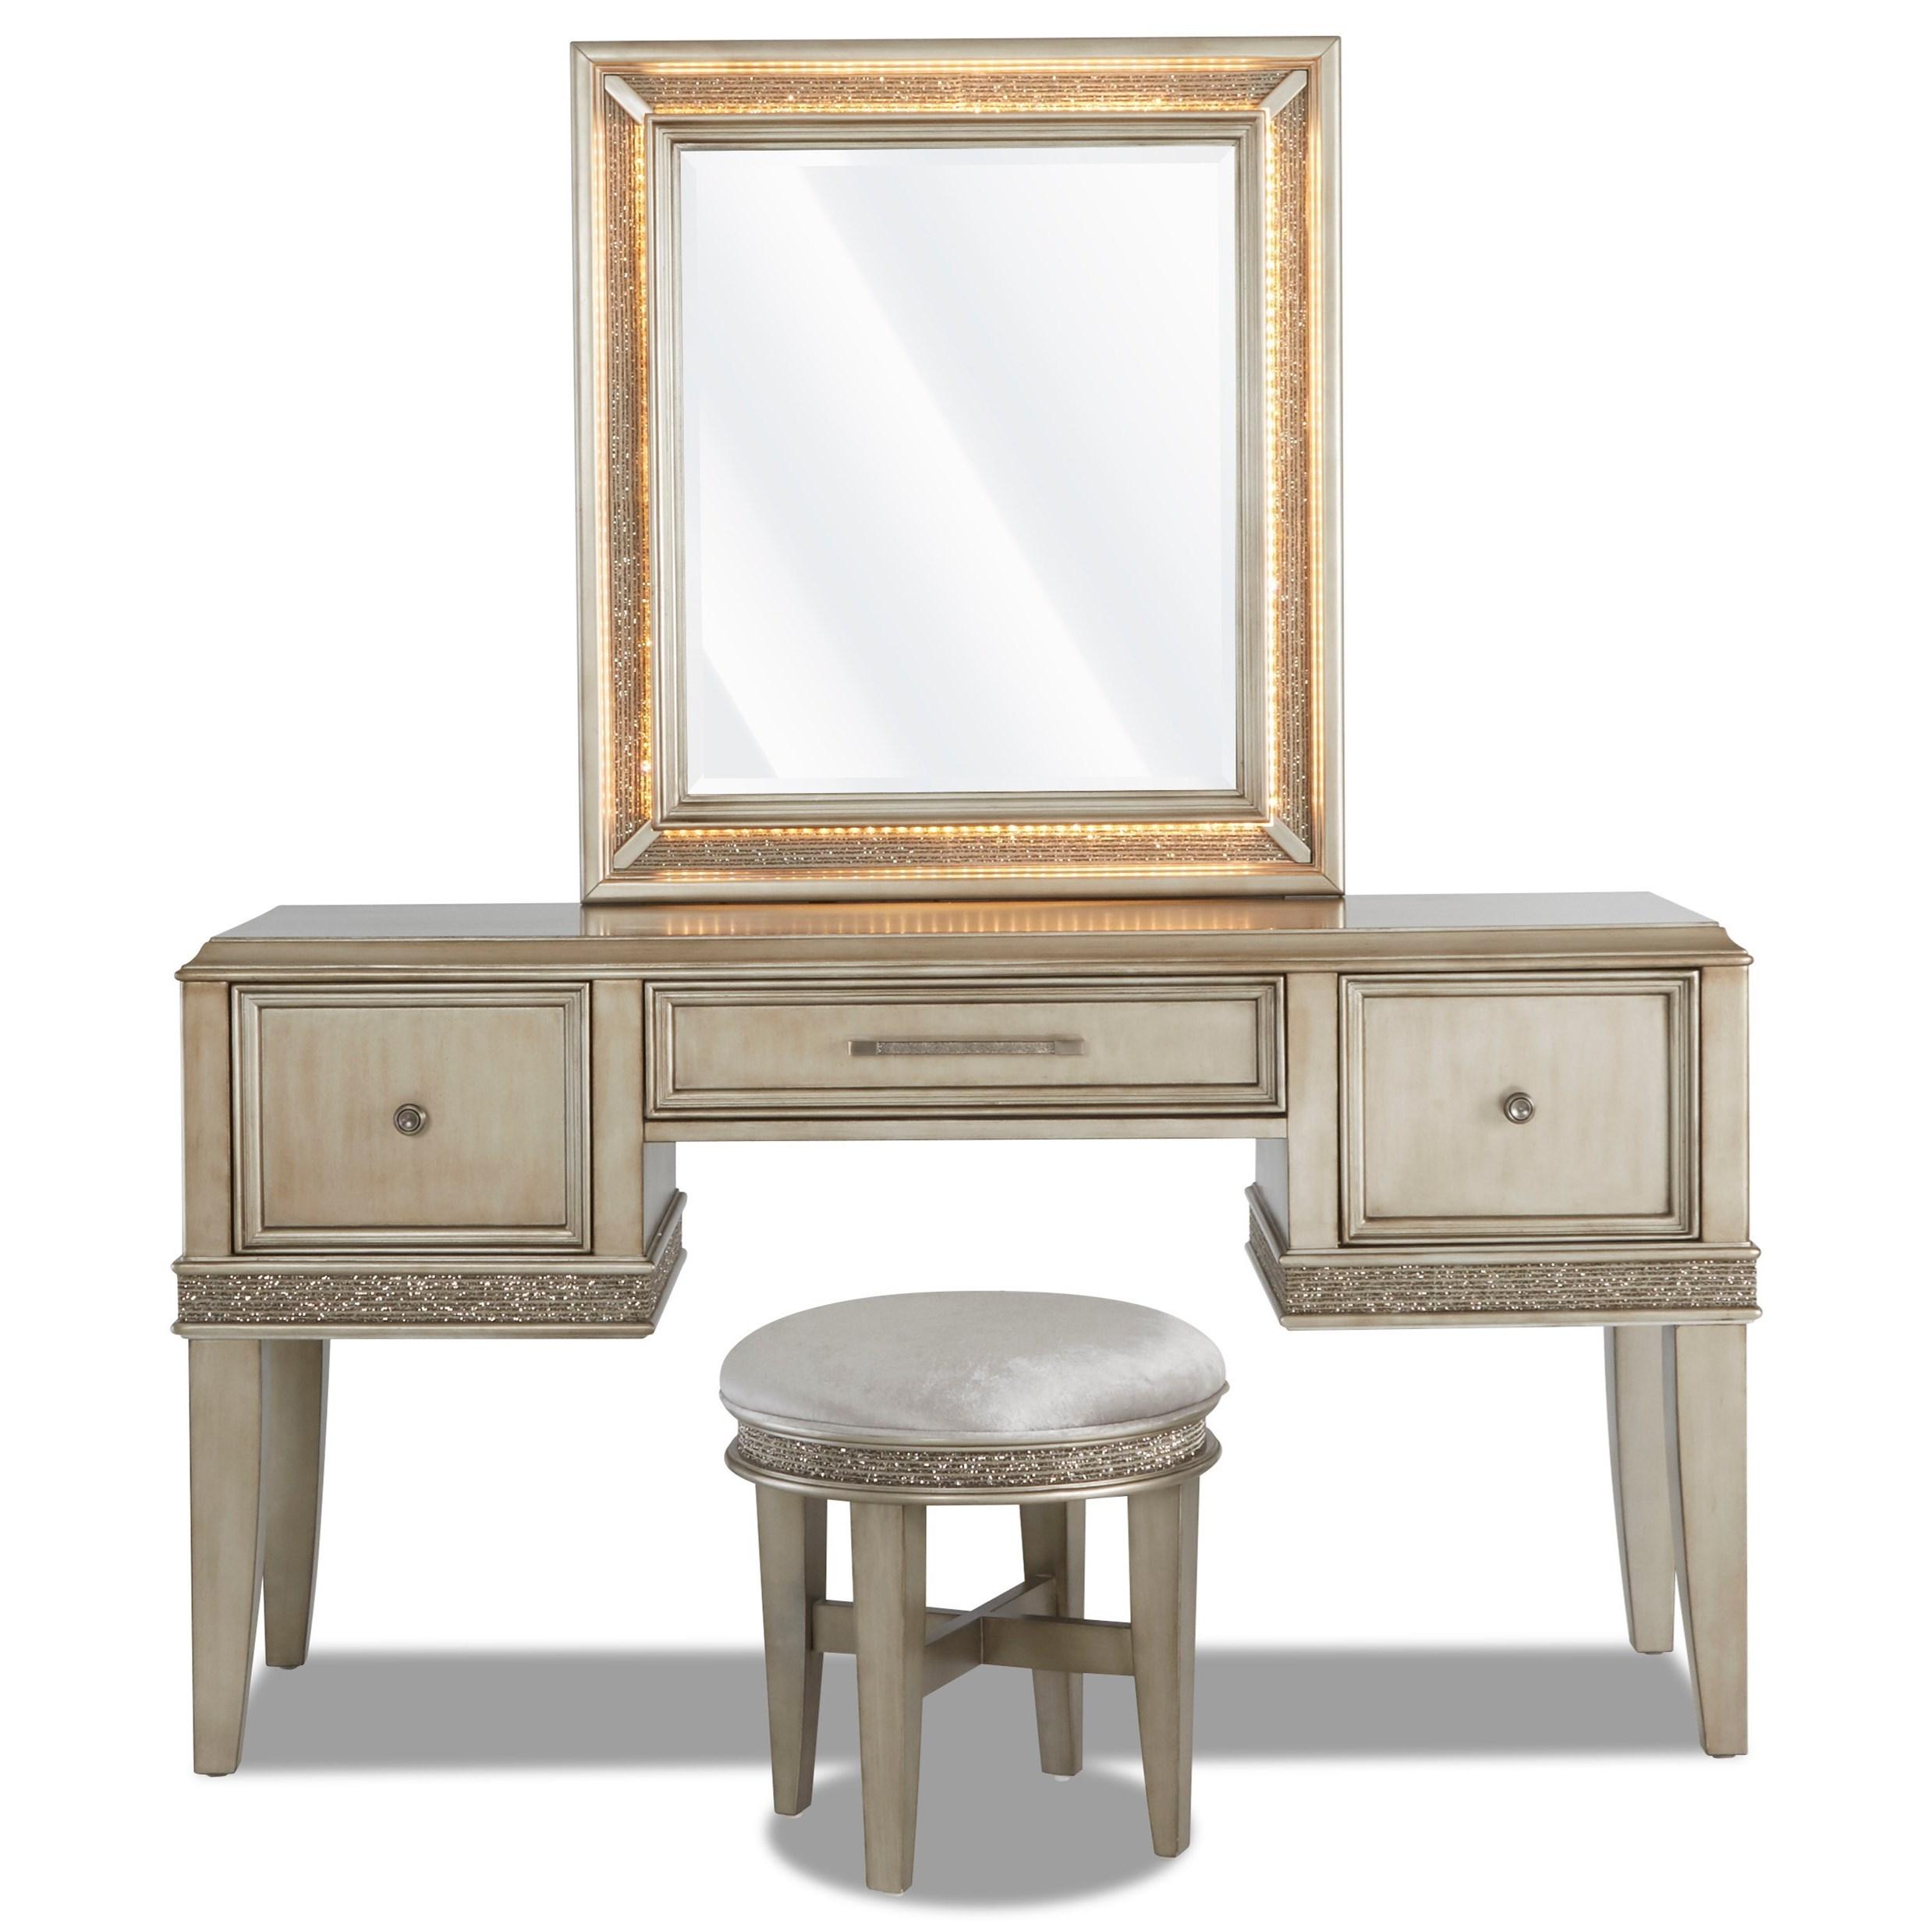 Sophia Vanity, Stool, and Mirror by Klaussner International at Beck's Furniture